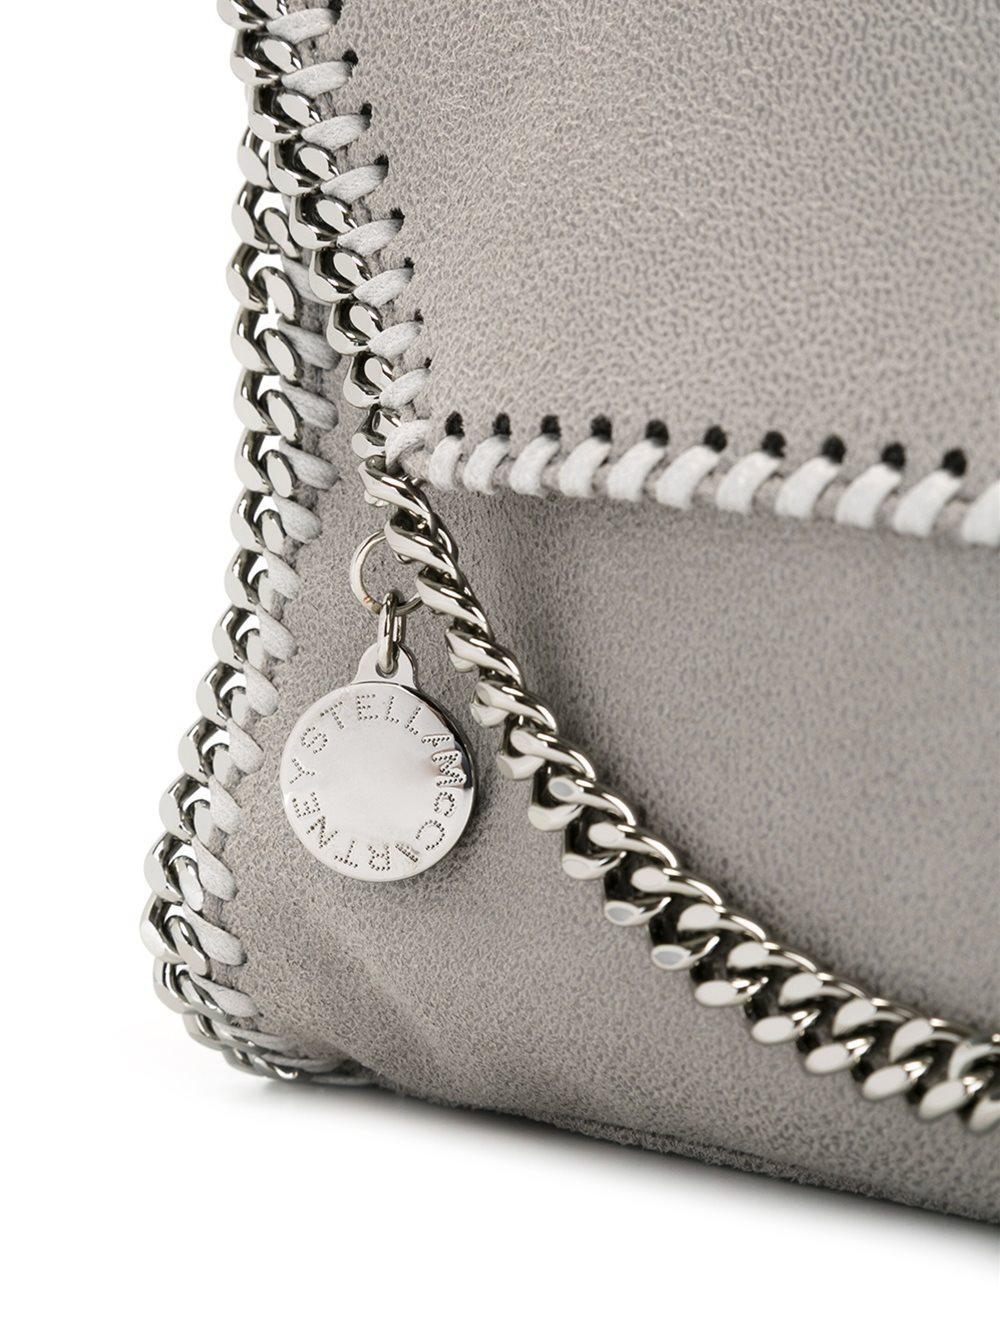 Stella McCartney Synthetic Foldover Falabella Shoulder Bag in Grey (Grey)